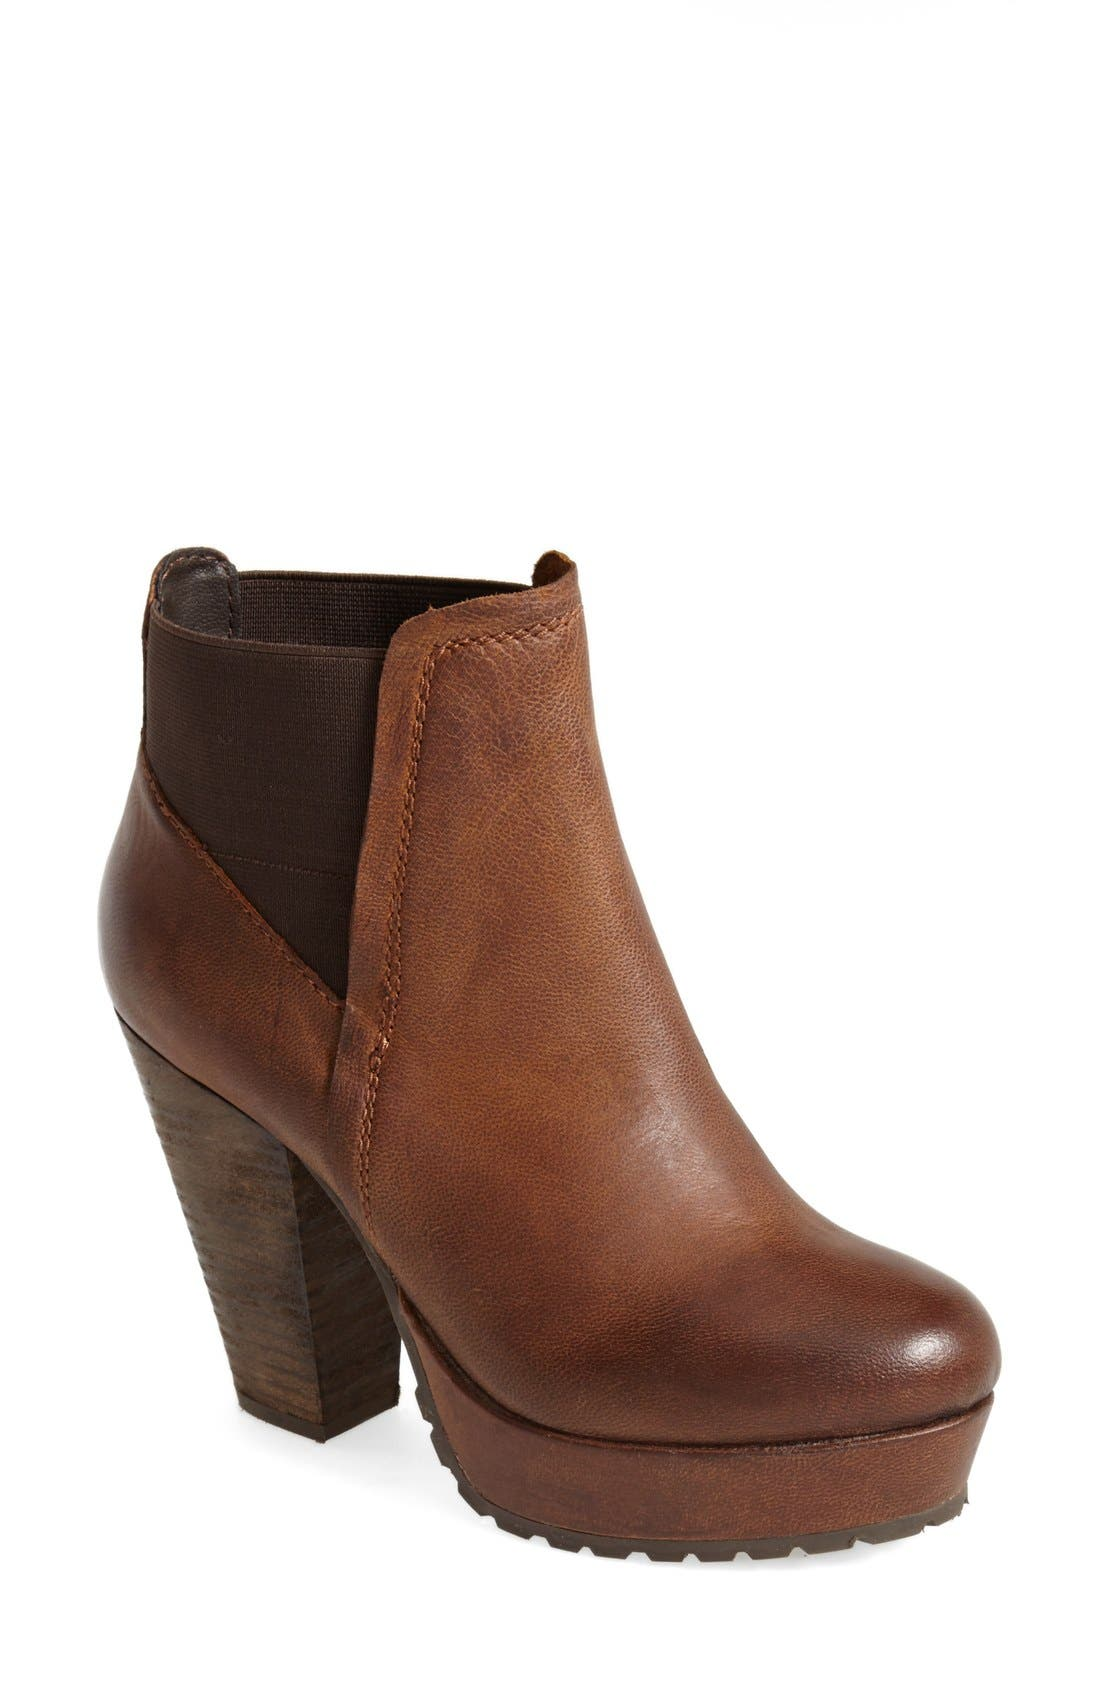 Alternate Image 1 Selected - Steve Madden 'Randaal' Leather Platform Bootie (Women)